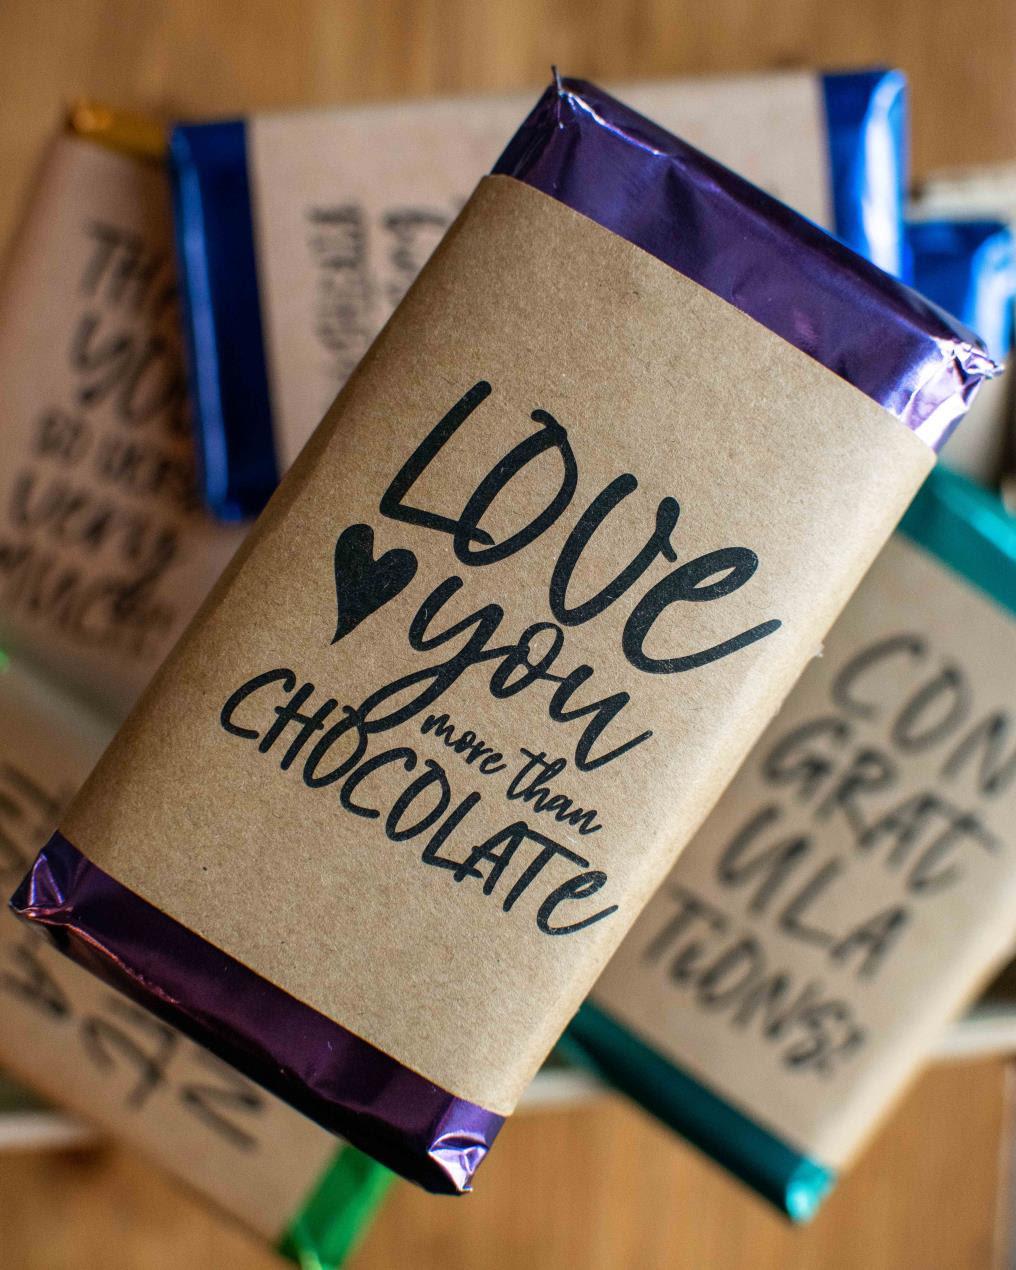 LDC_New Chocolate Bars